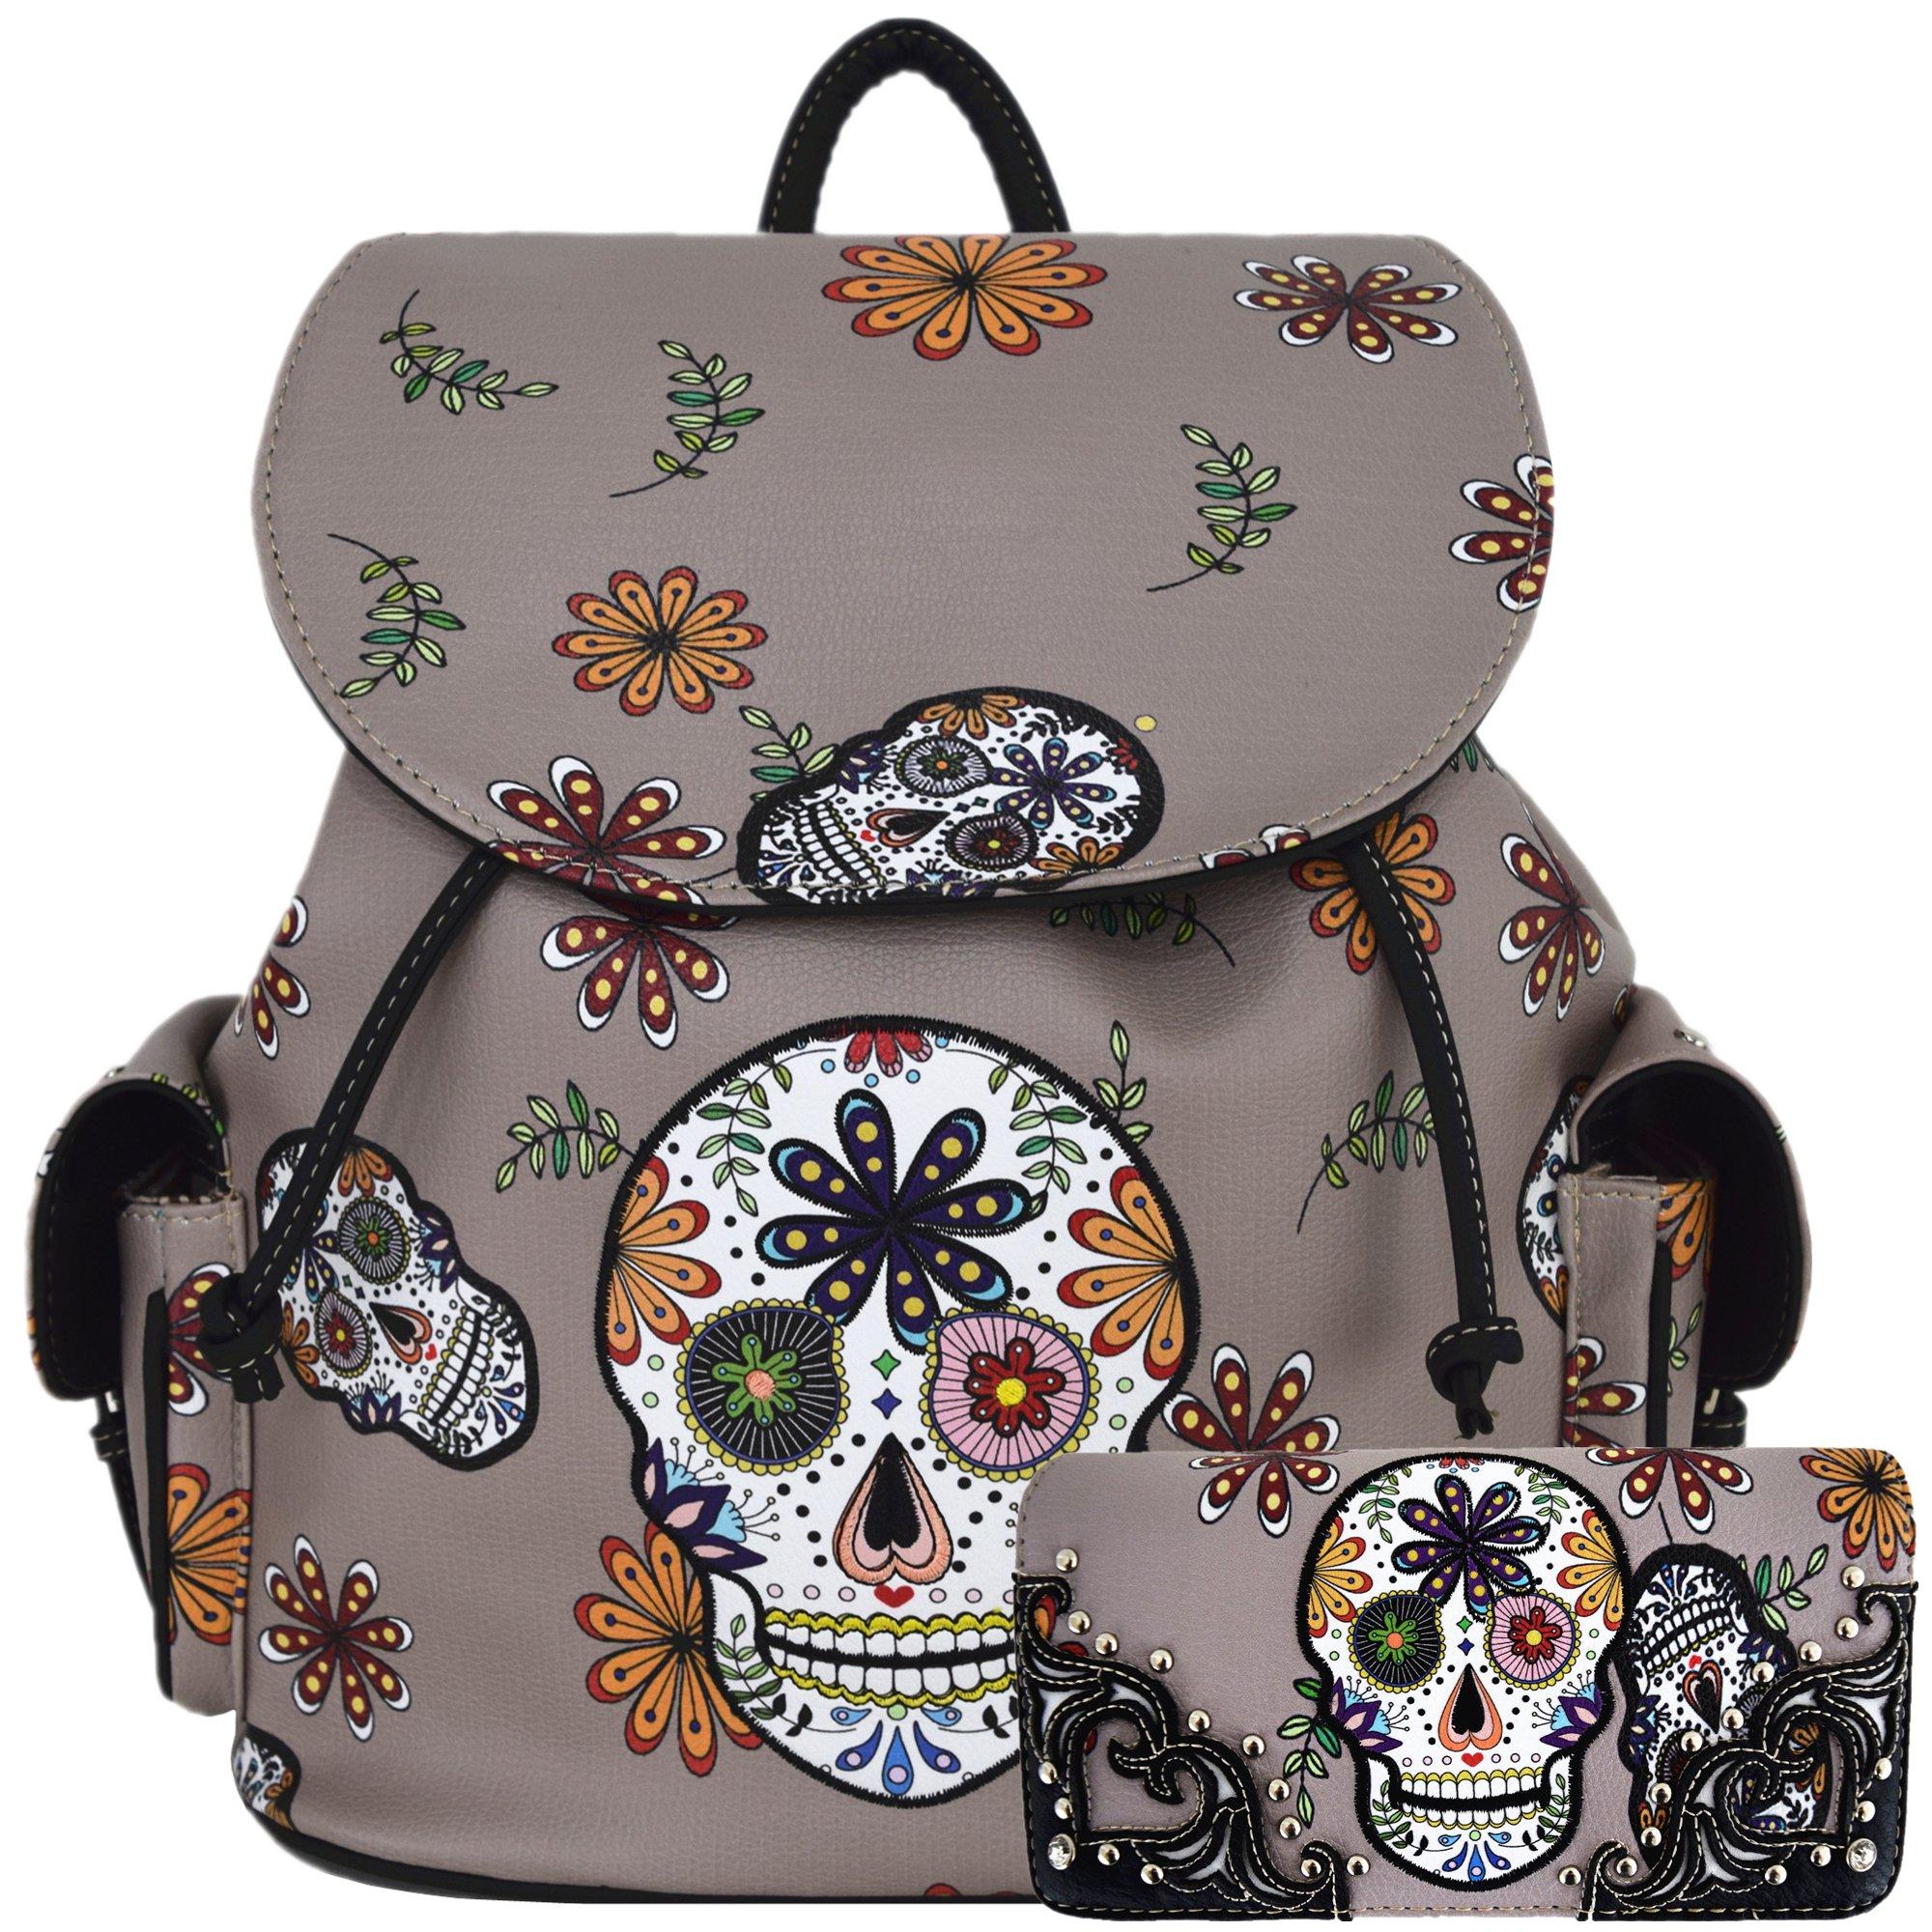 Sugar Skull Day of the Dead Daypack Concealed Carry Backpack Fashion Women Travel Biker Purse Wallet Set (Gray Set)